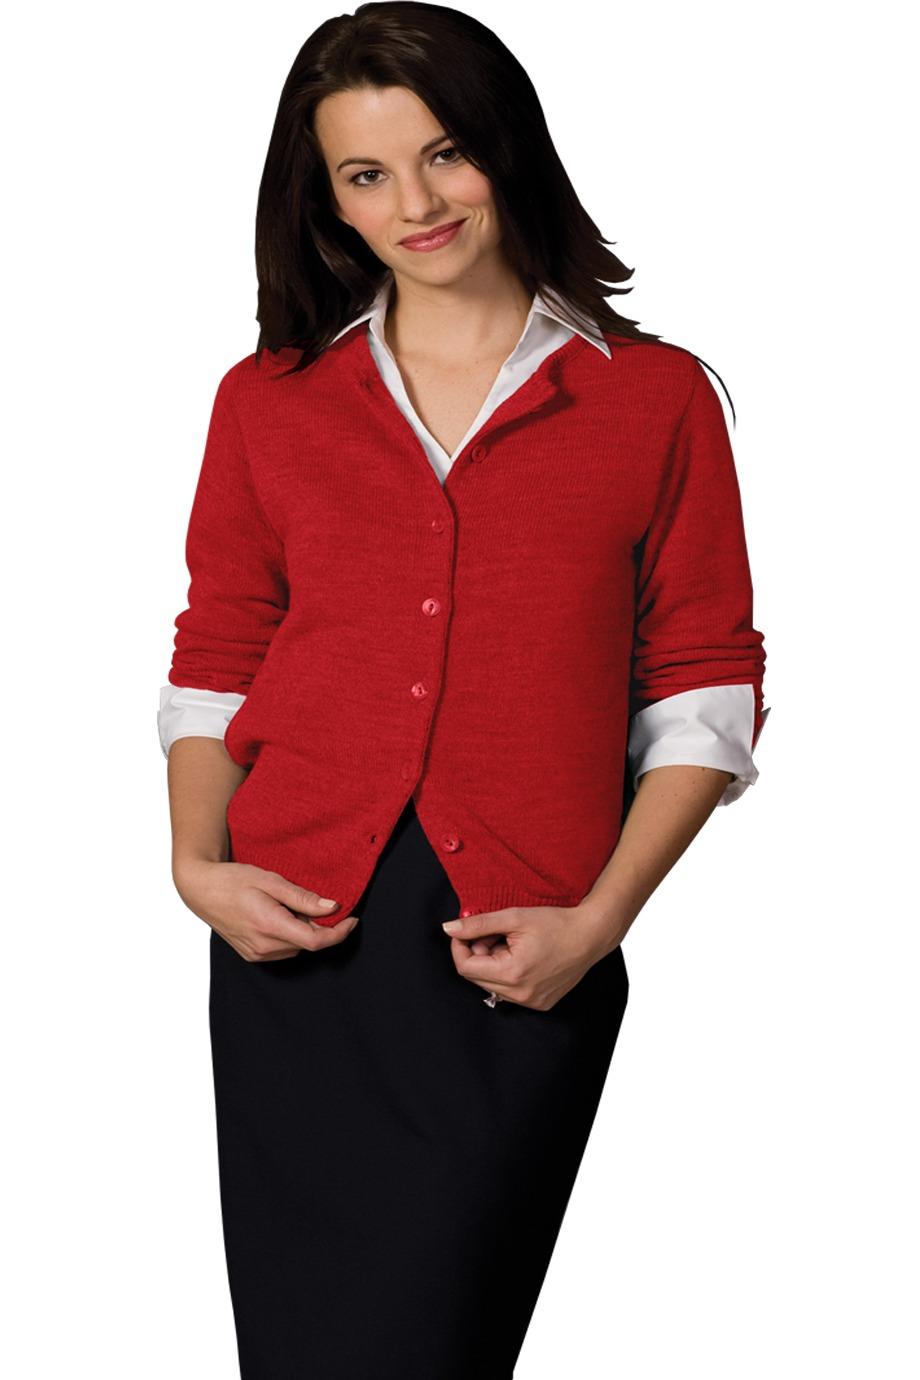 Edwards Garment 220 - Women's Jewel Neck Cardigan